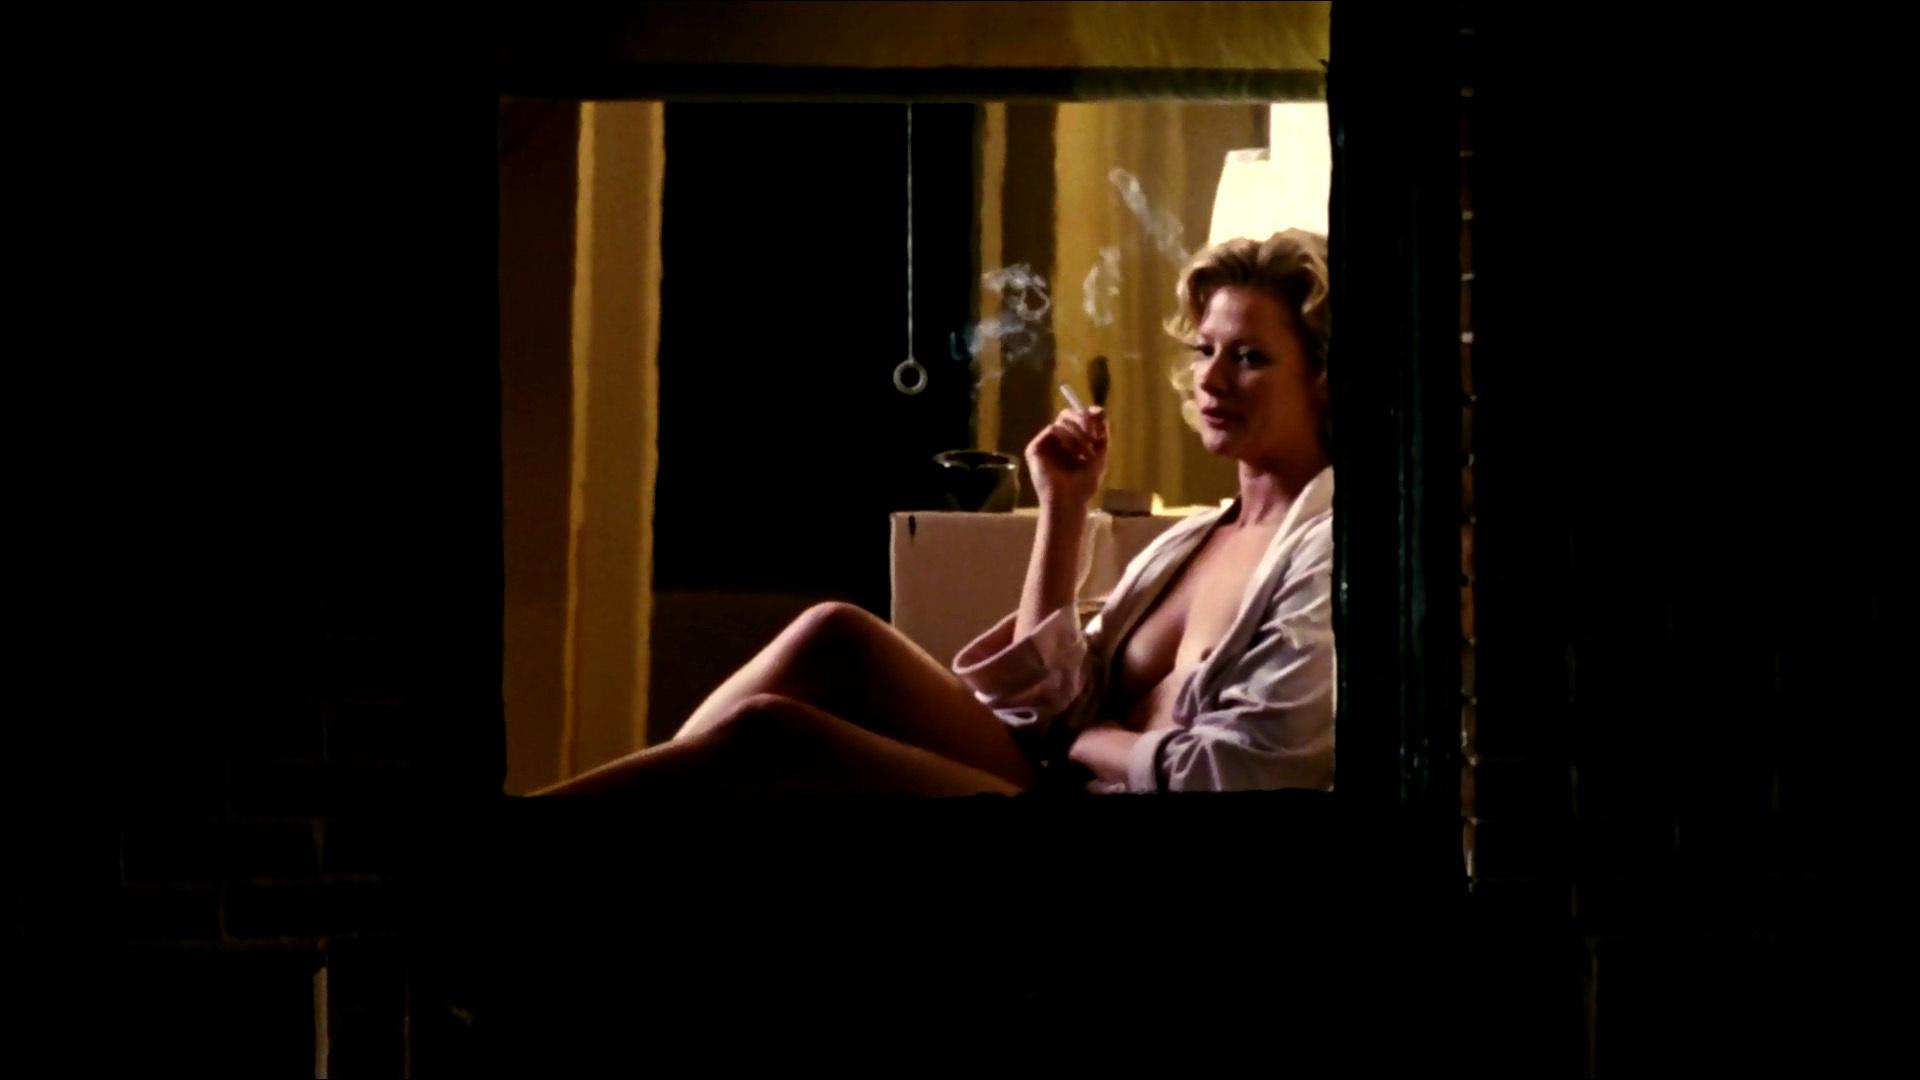 Gretchen Mol - An American Affair HD 1080p 02.jpg